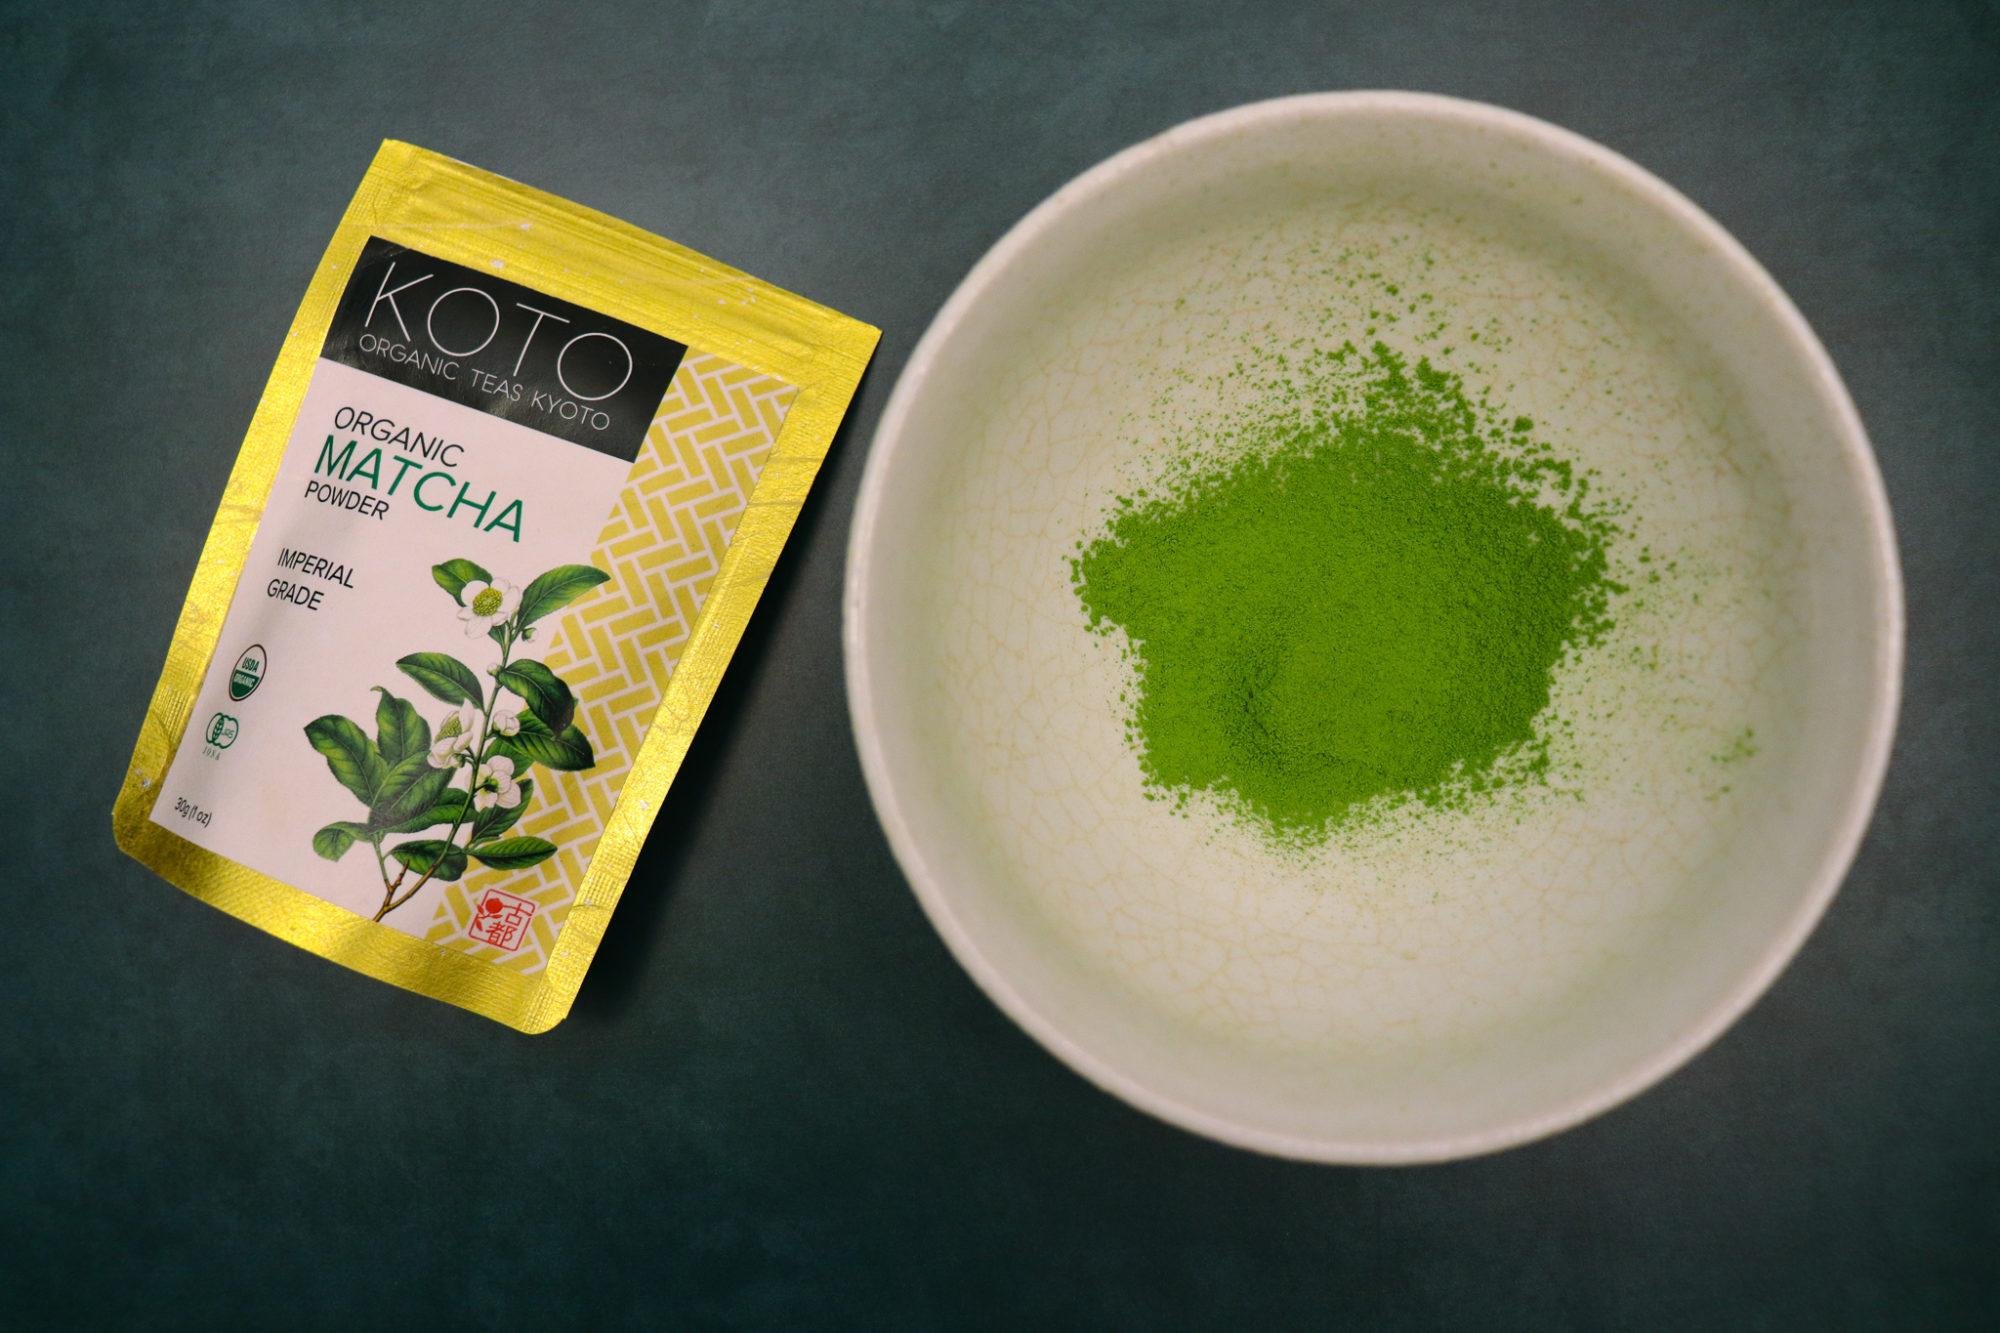 Koto Tea Organic Matcha – Imperial Grade